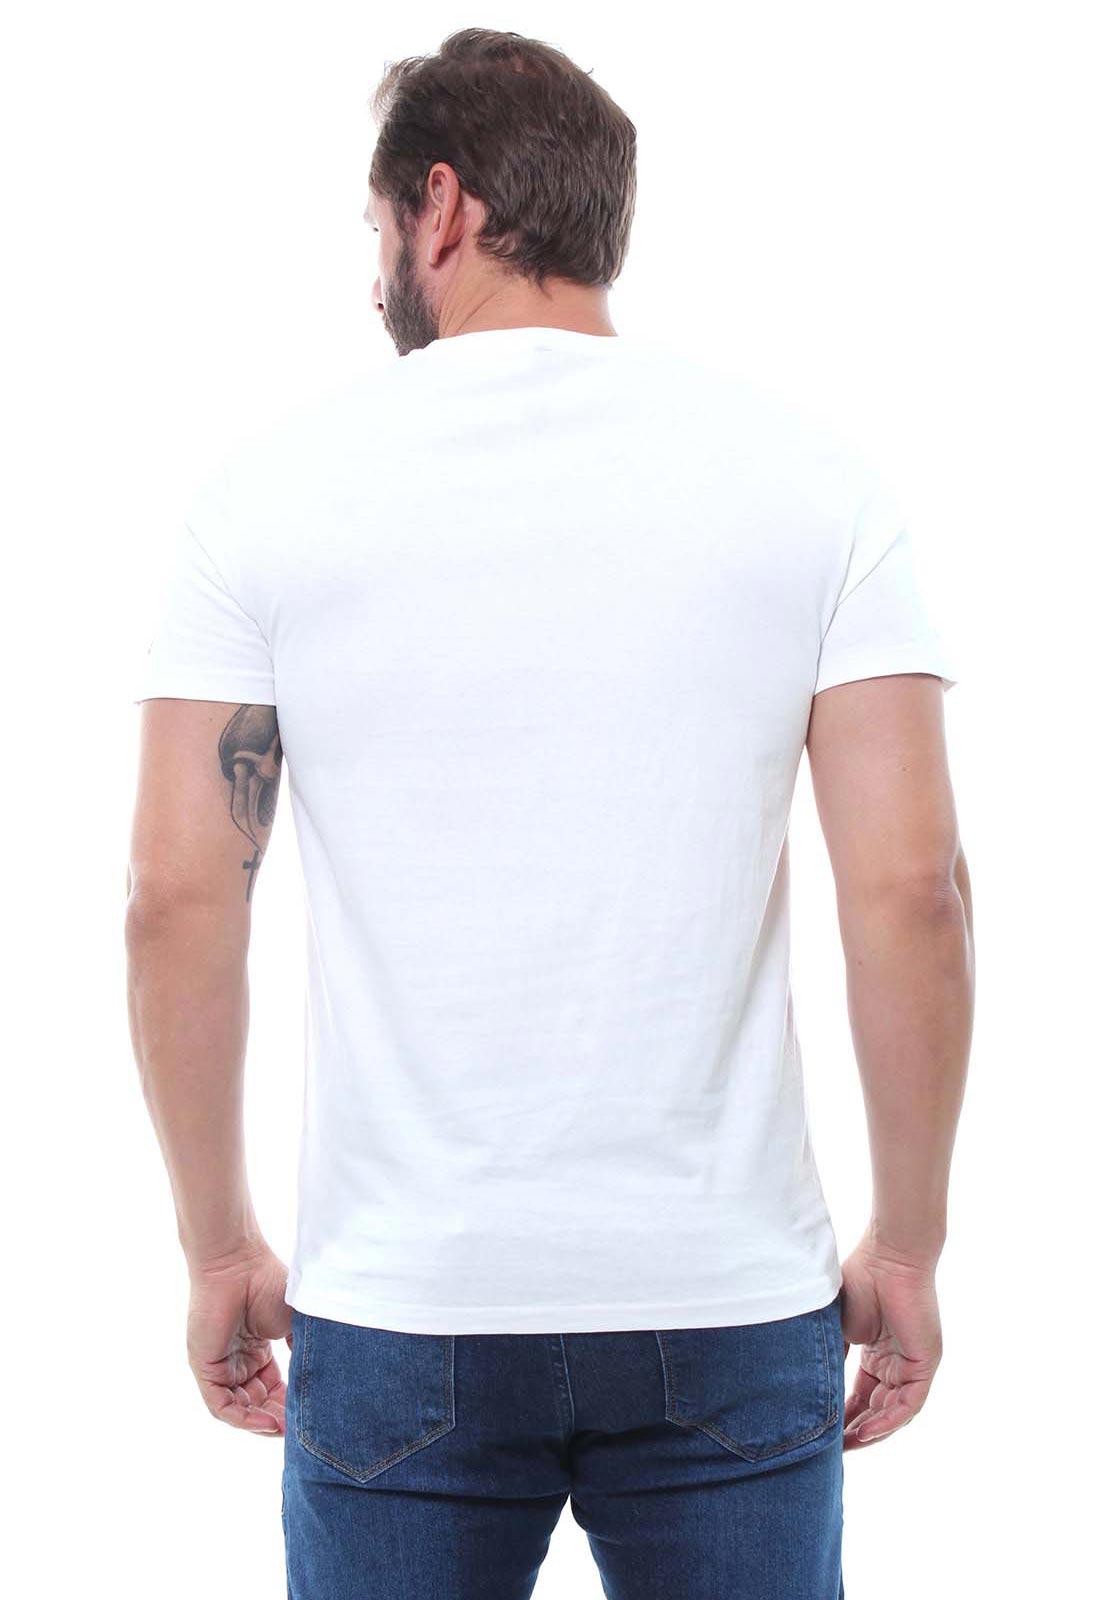 Camiseta Masculina Manga Curta Crocker - 47854  - CROCKER JEANS